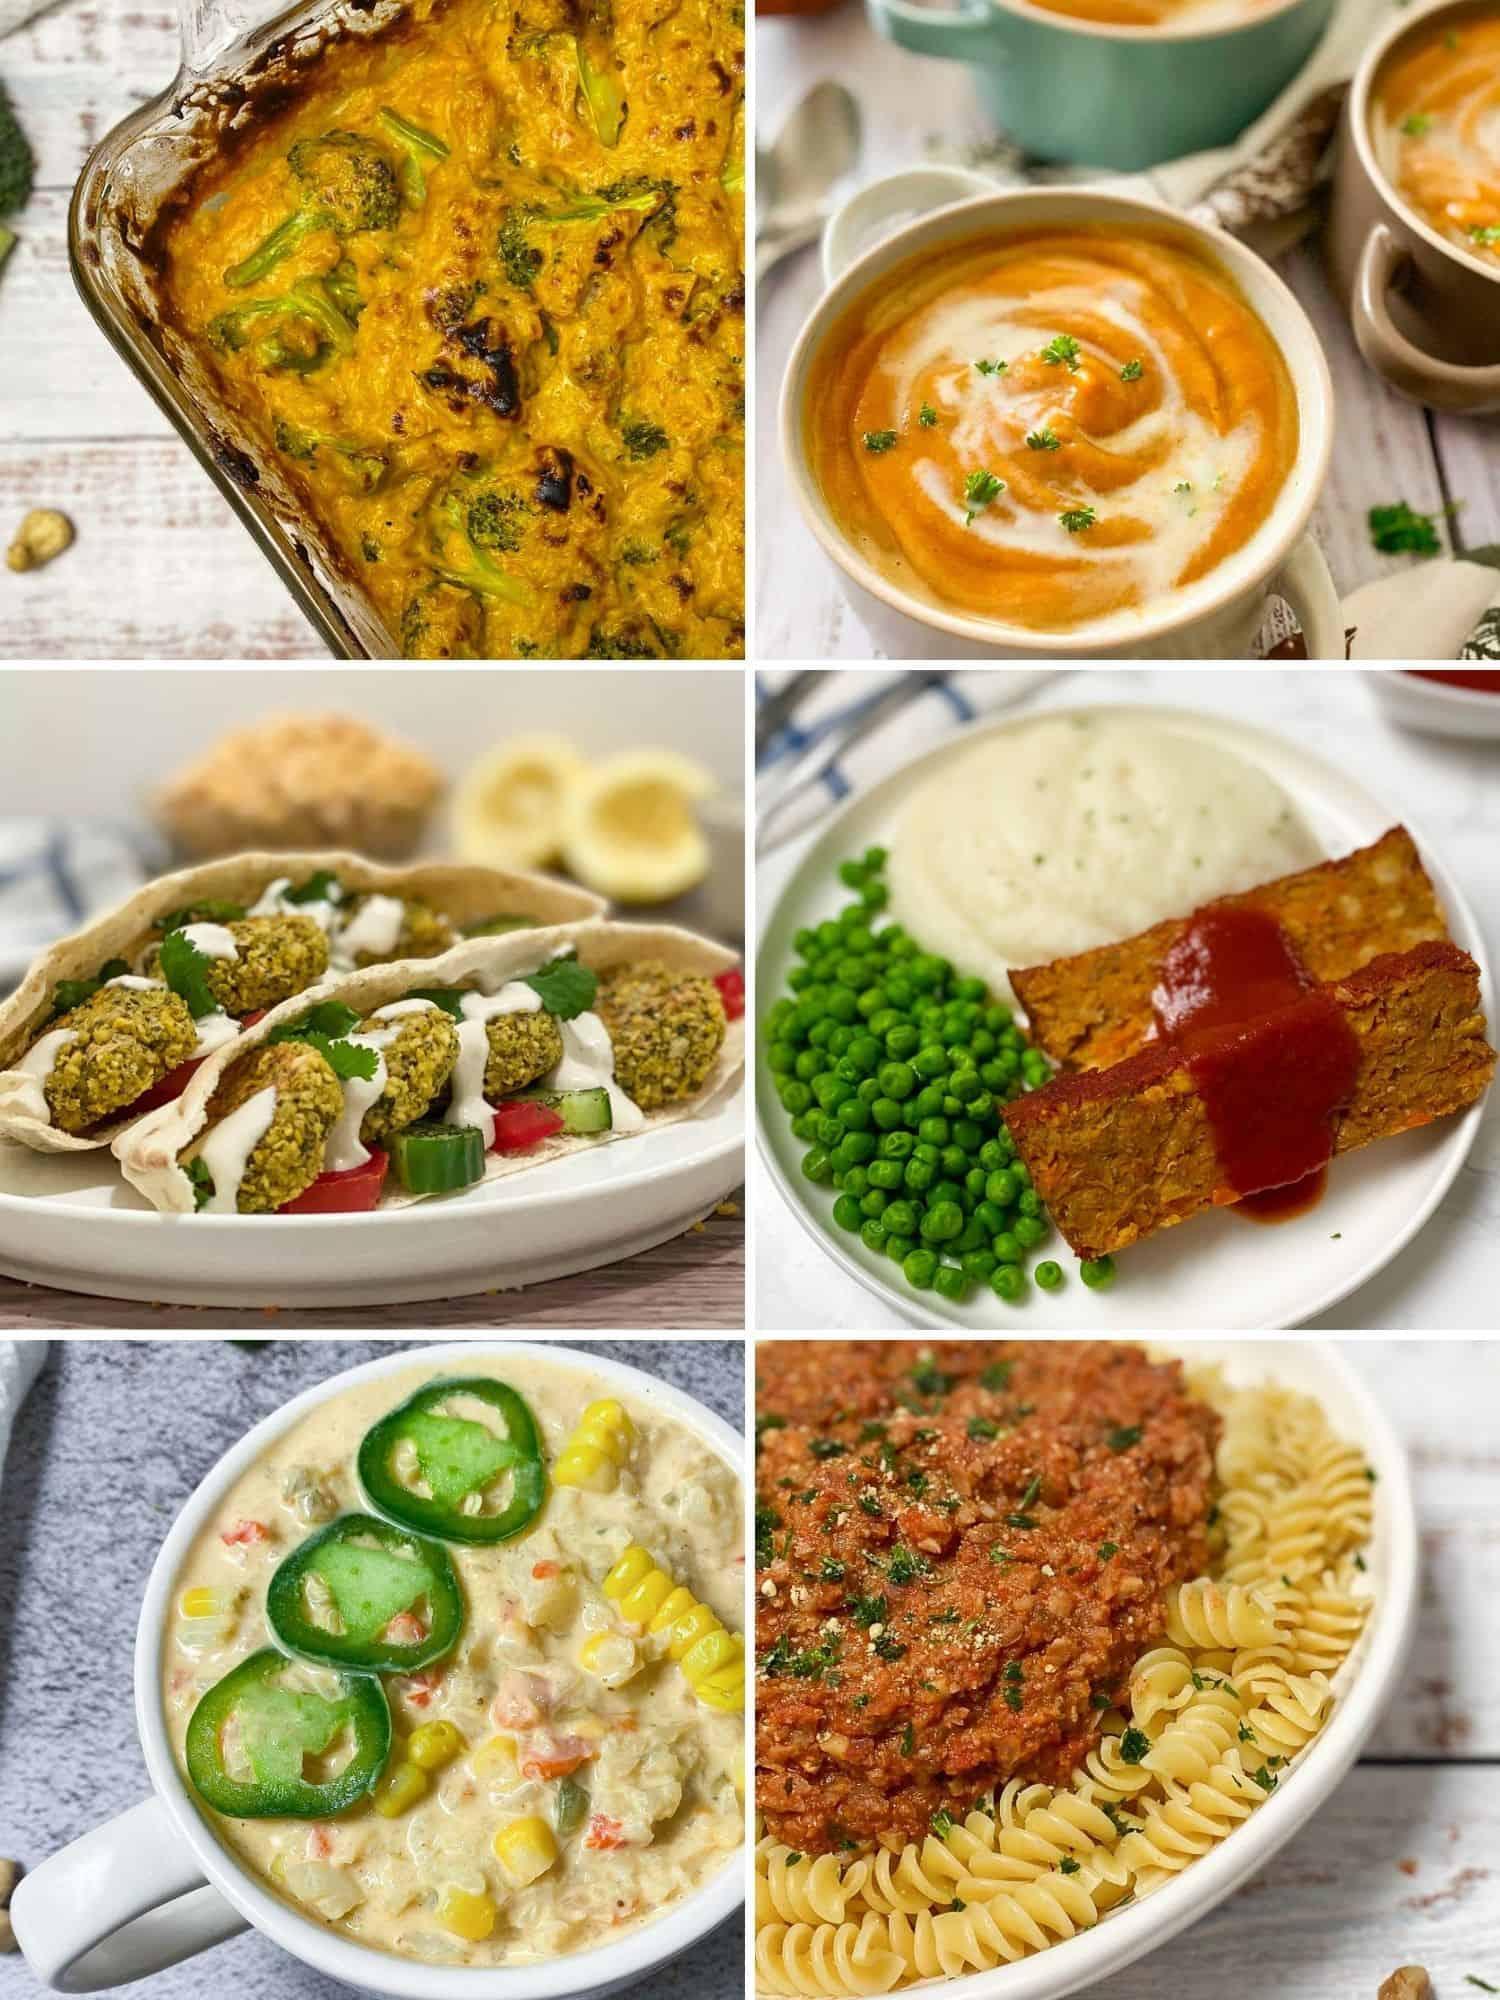 Collage of 6 dinner recipes: casserole, soup, falafel, meatloaf, chowder, pasta.